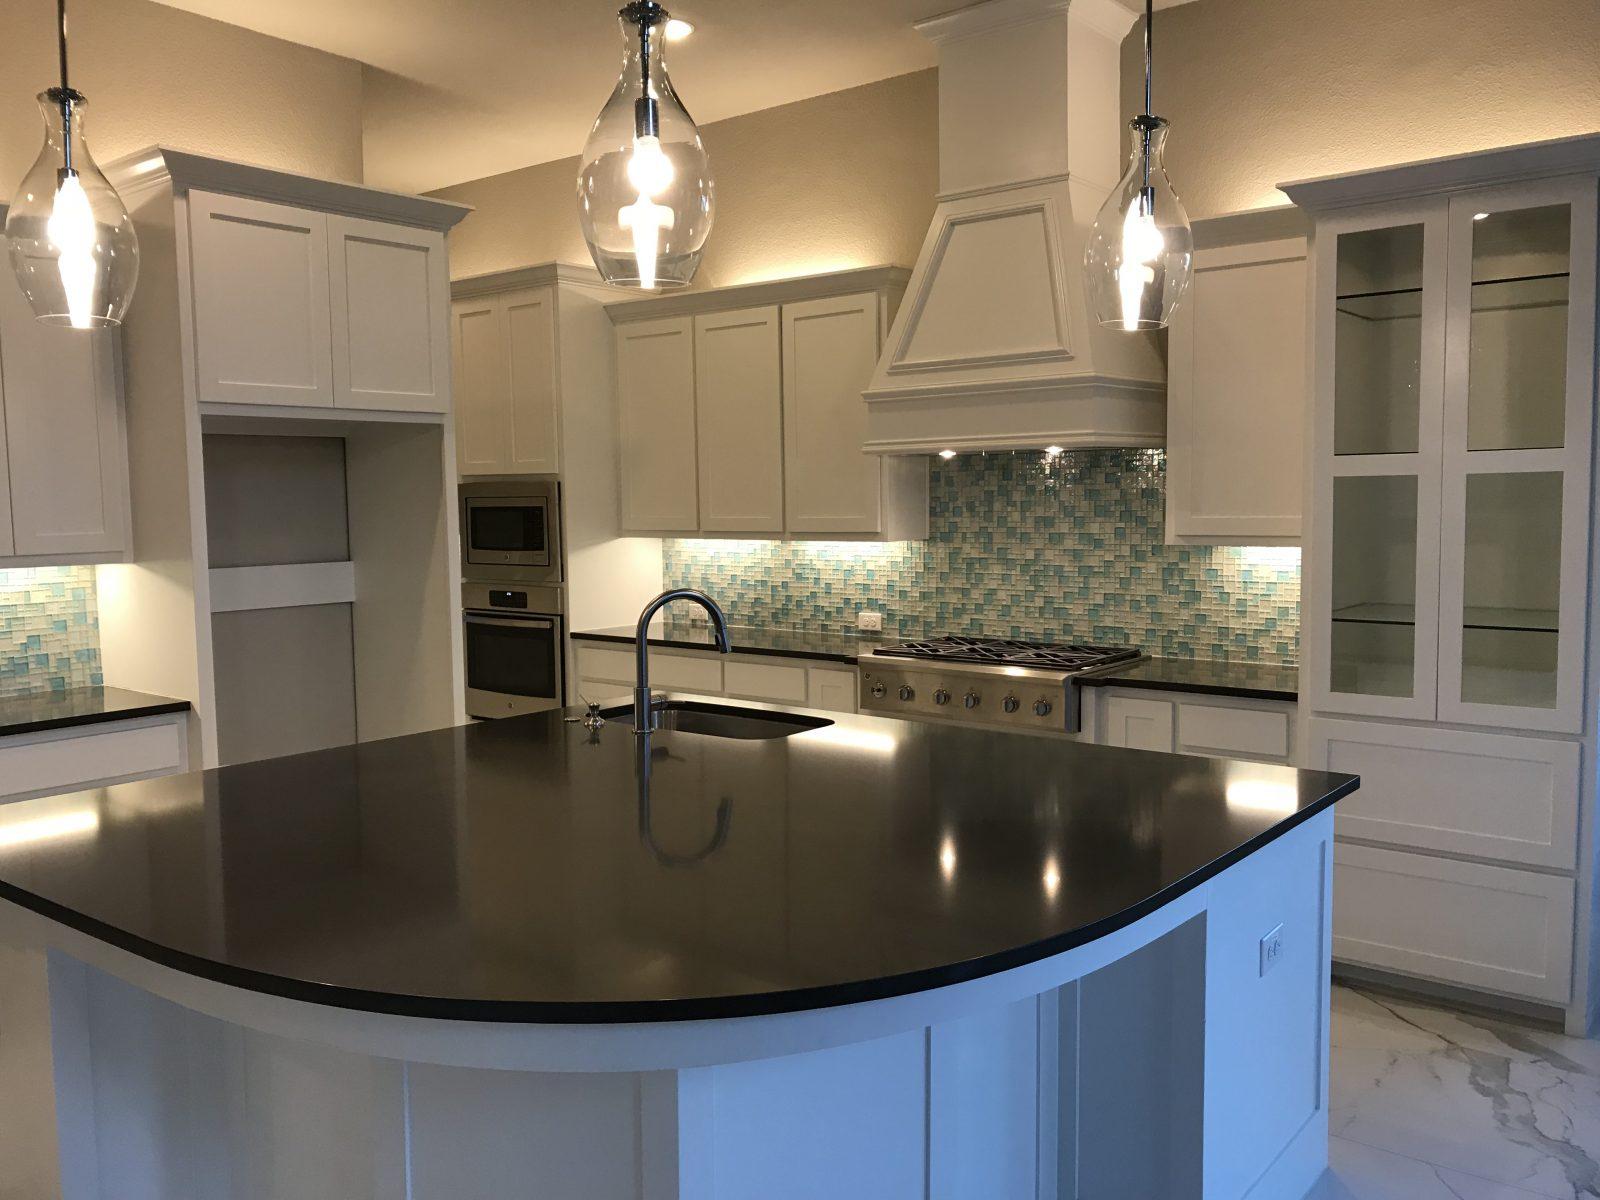 Quartz Countertops, Backsplash, and floor tile in Frisco